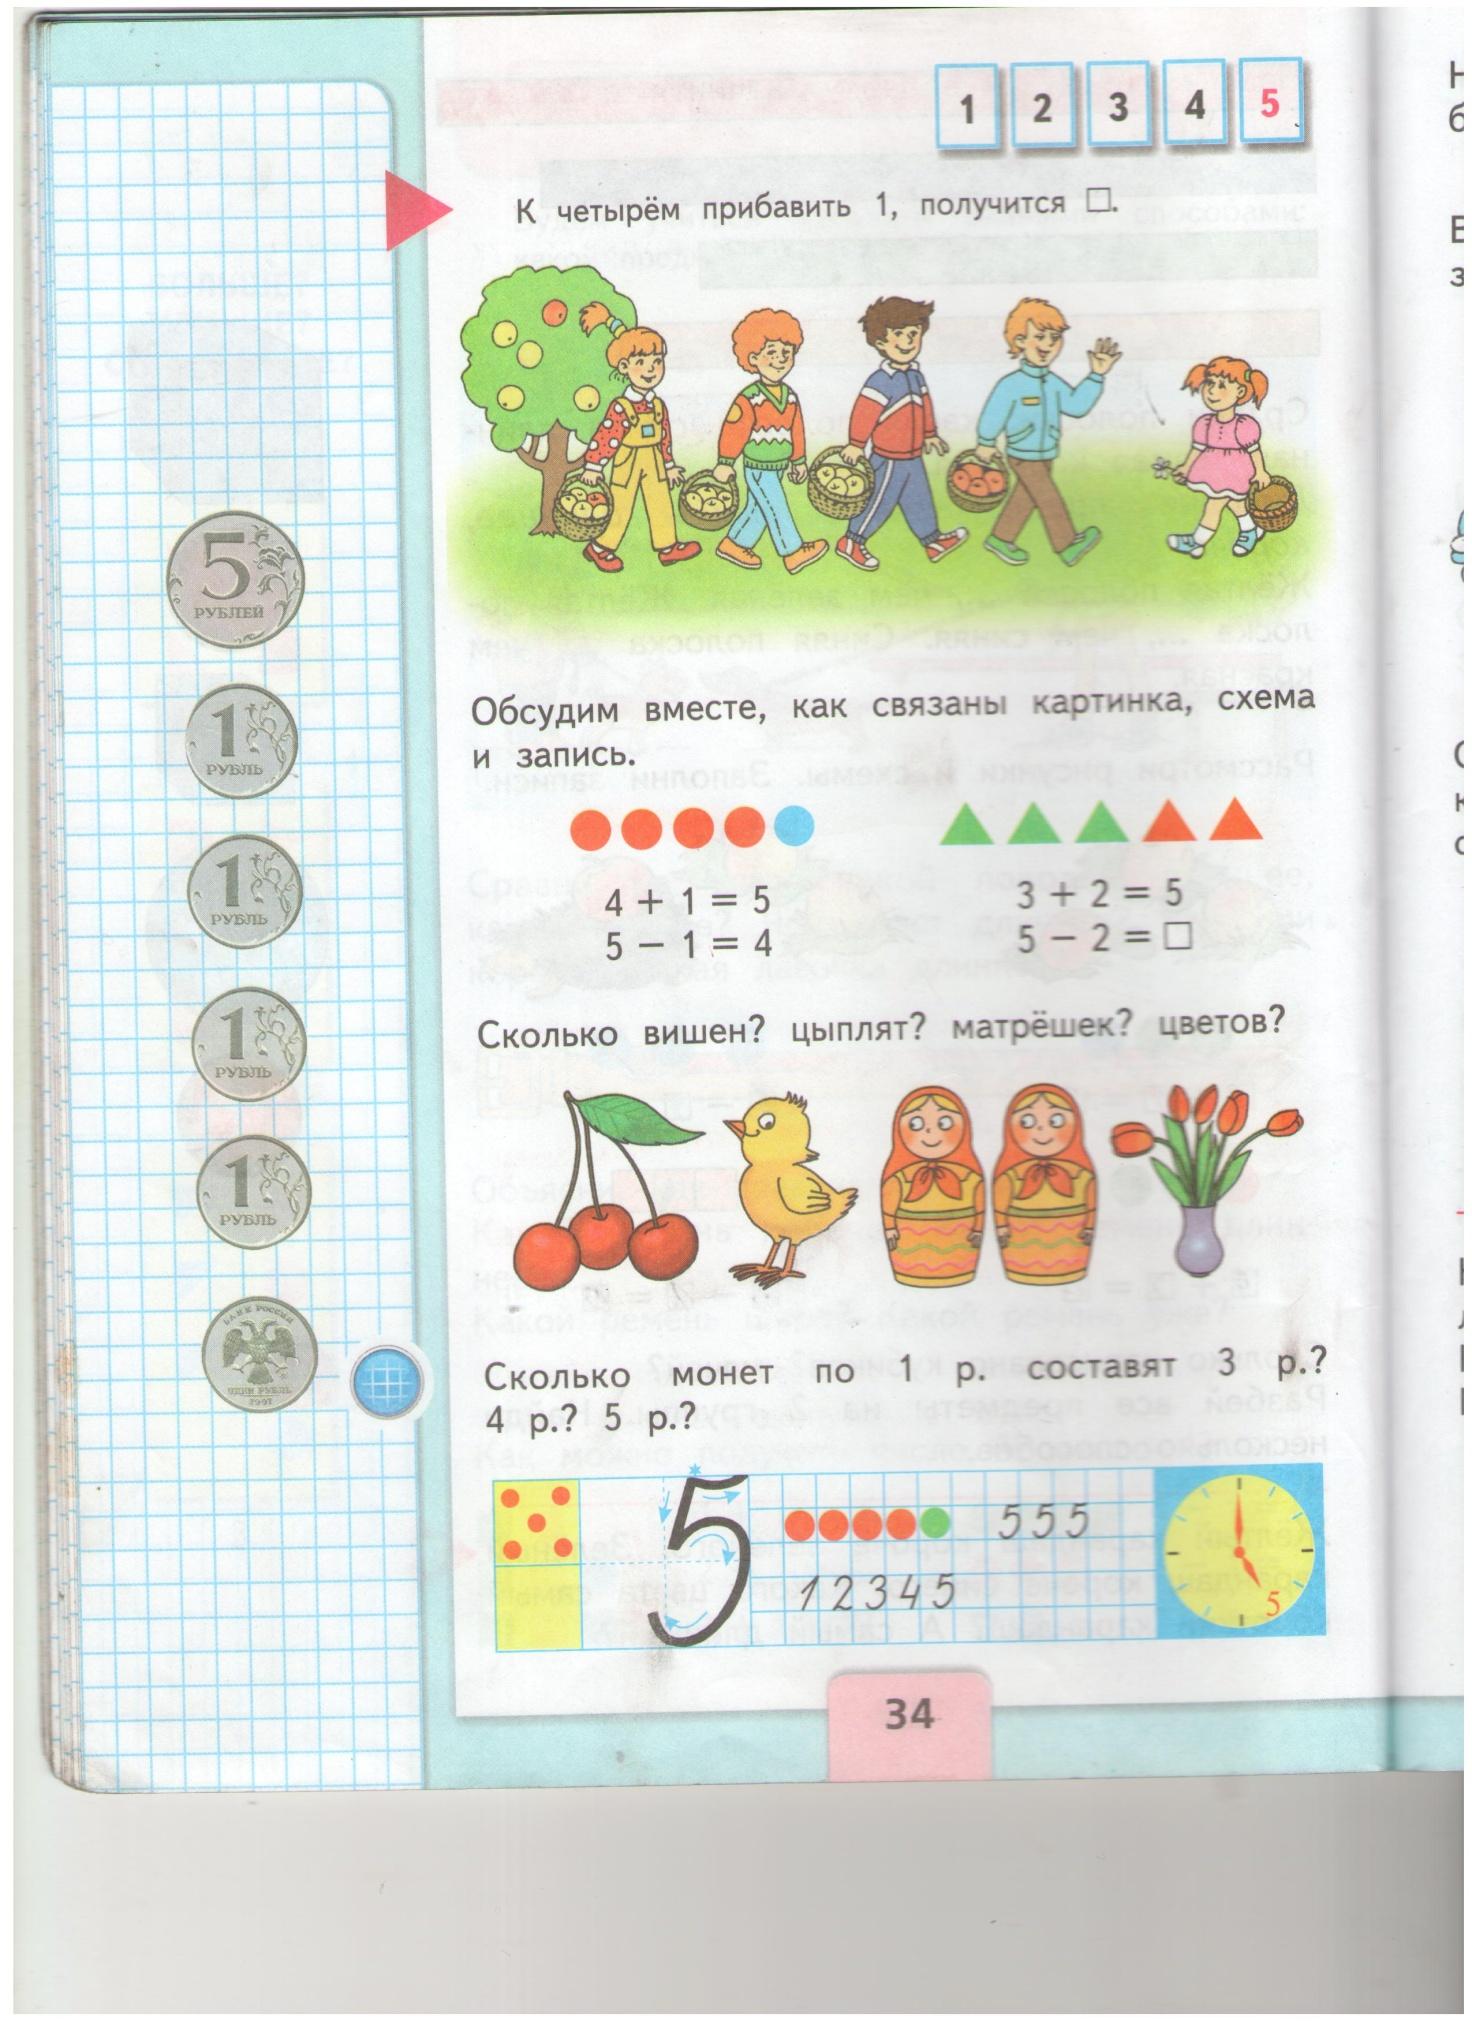 Урок математики 1 класс моро числа 6.7 письмо цифры